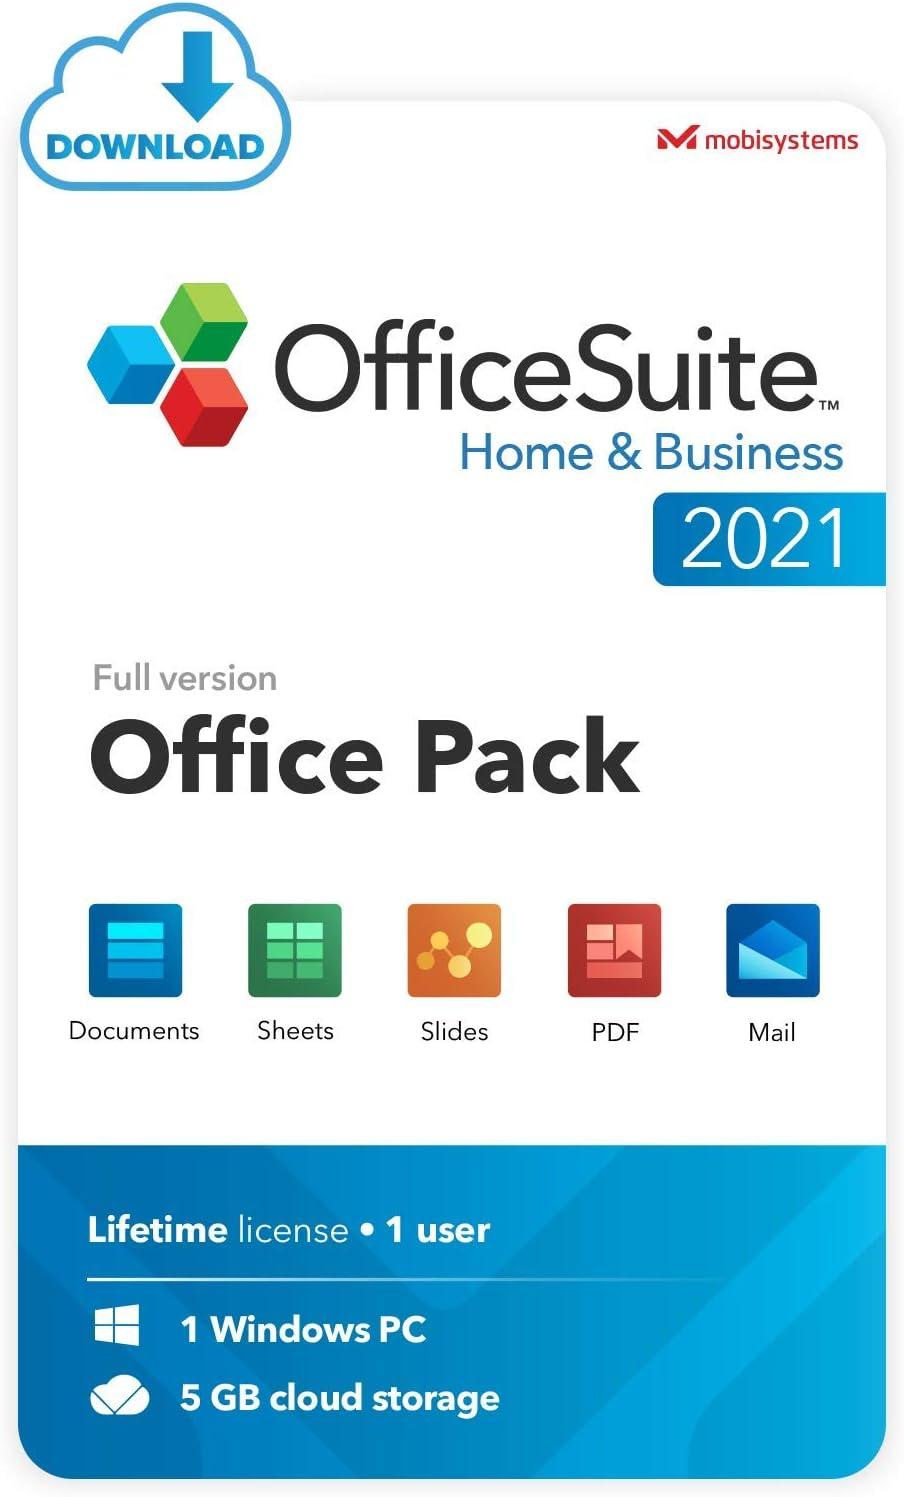 OfficeSuite Home & Business 2021 - Lifetime License - Documents, Sheets, Slides, PDF, Mail & Calendar for Windows [PC Online code]